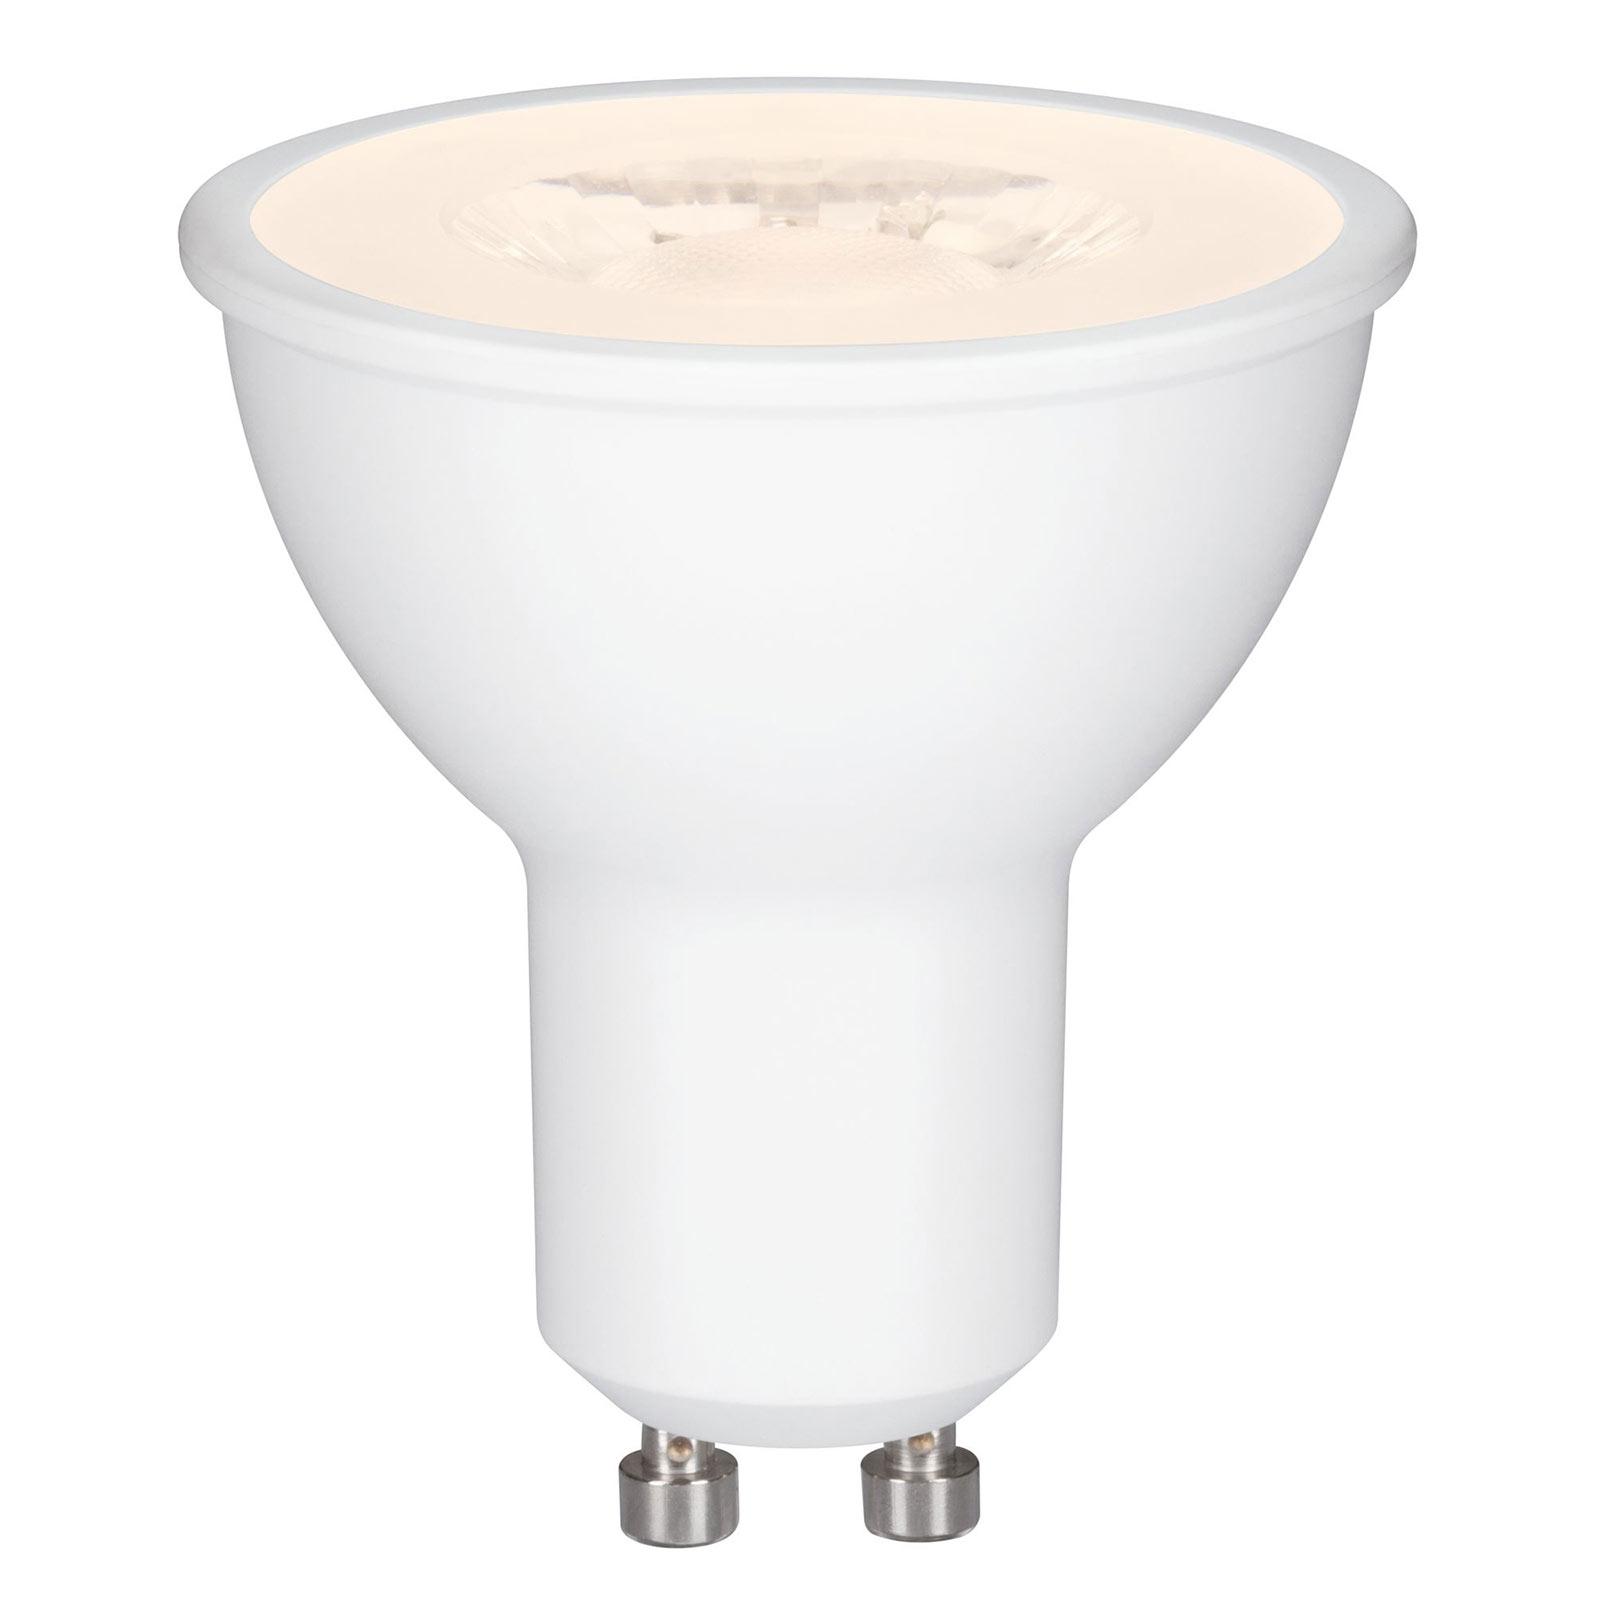 Paulmann LED-reflektor GU10 6,5W 2700K 3-step-dim